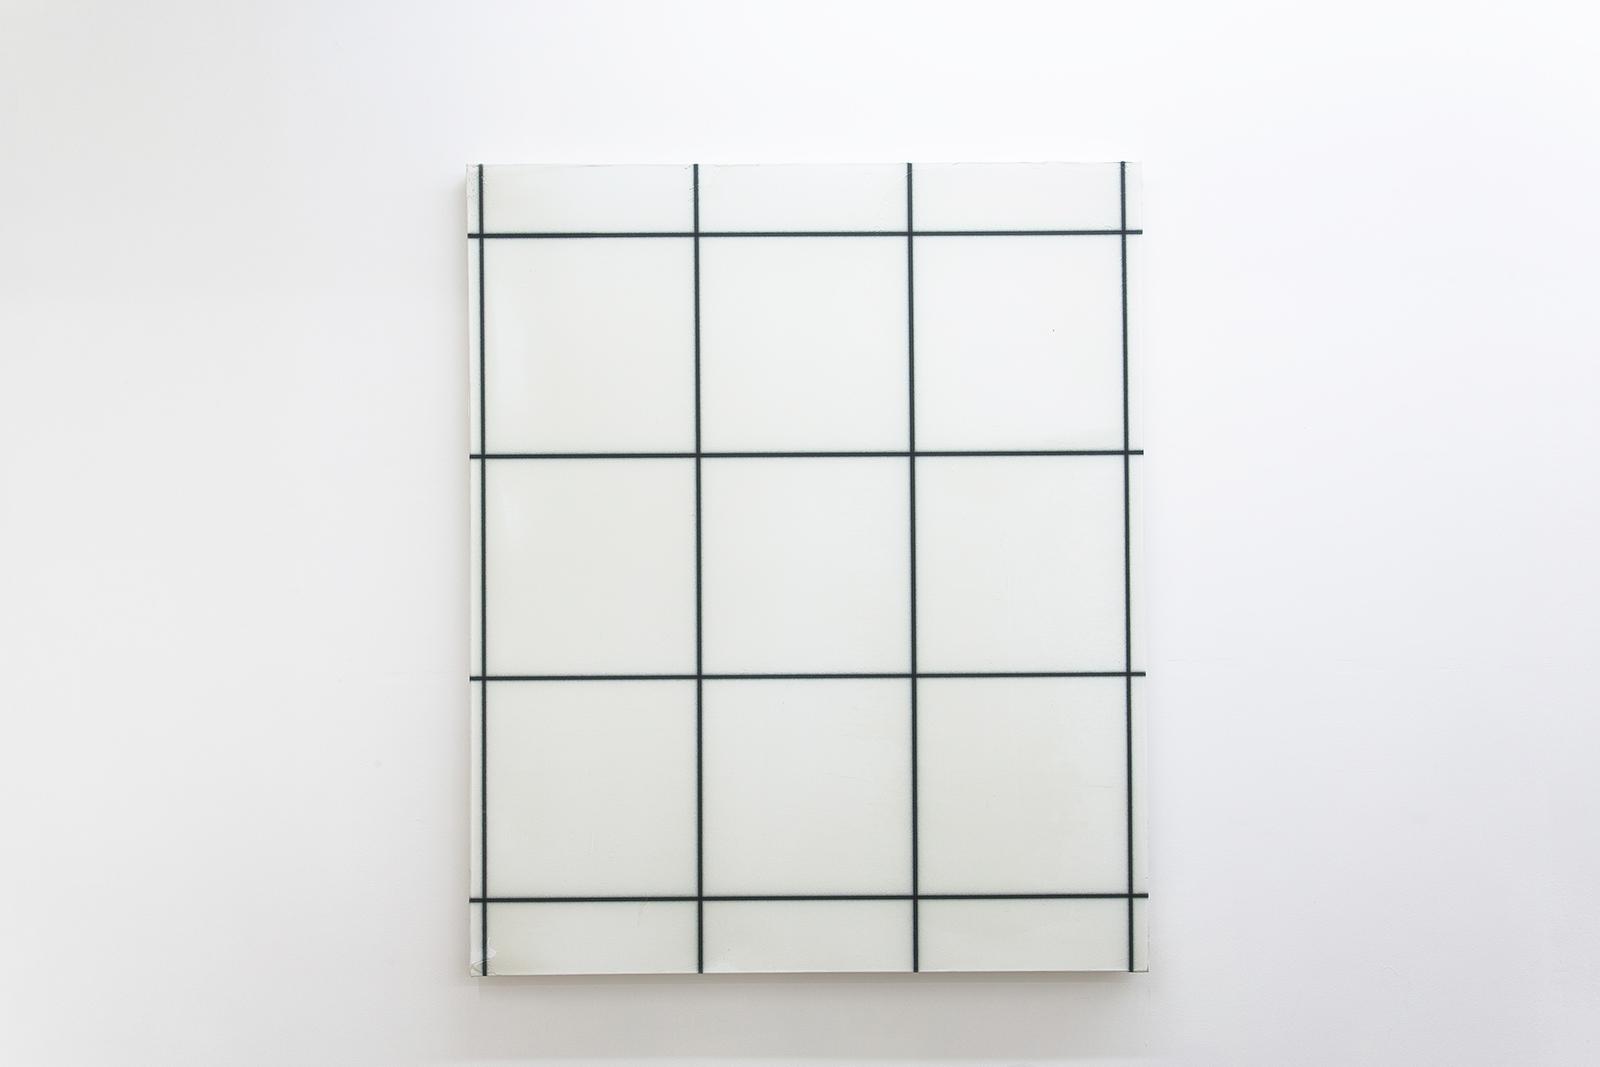 Thomas Baumann Untitled, 2014-2015 acrylic on canvas 120 x 100 cm